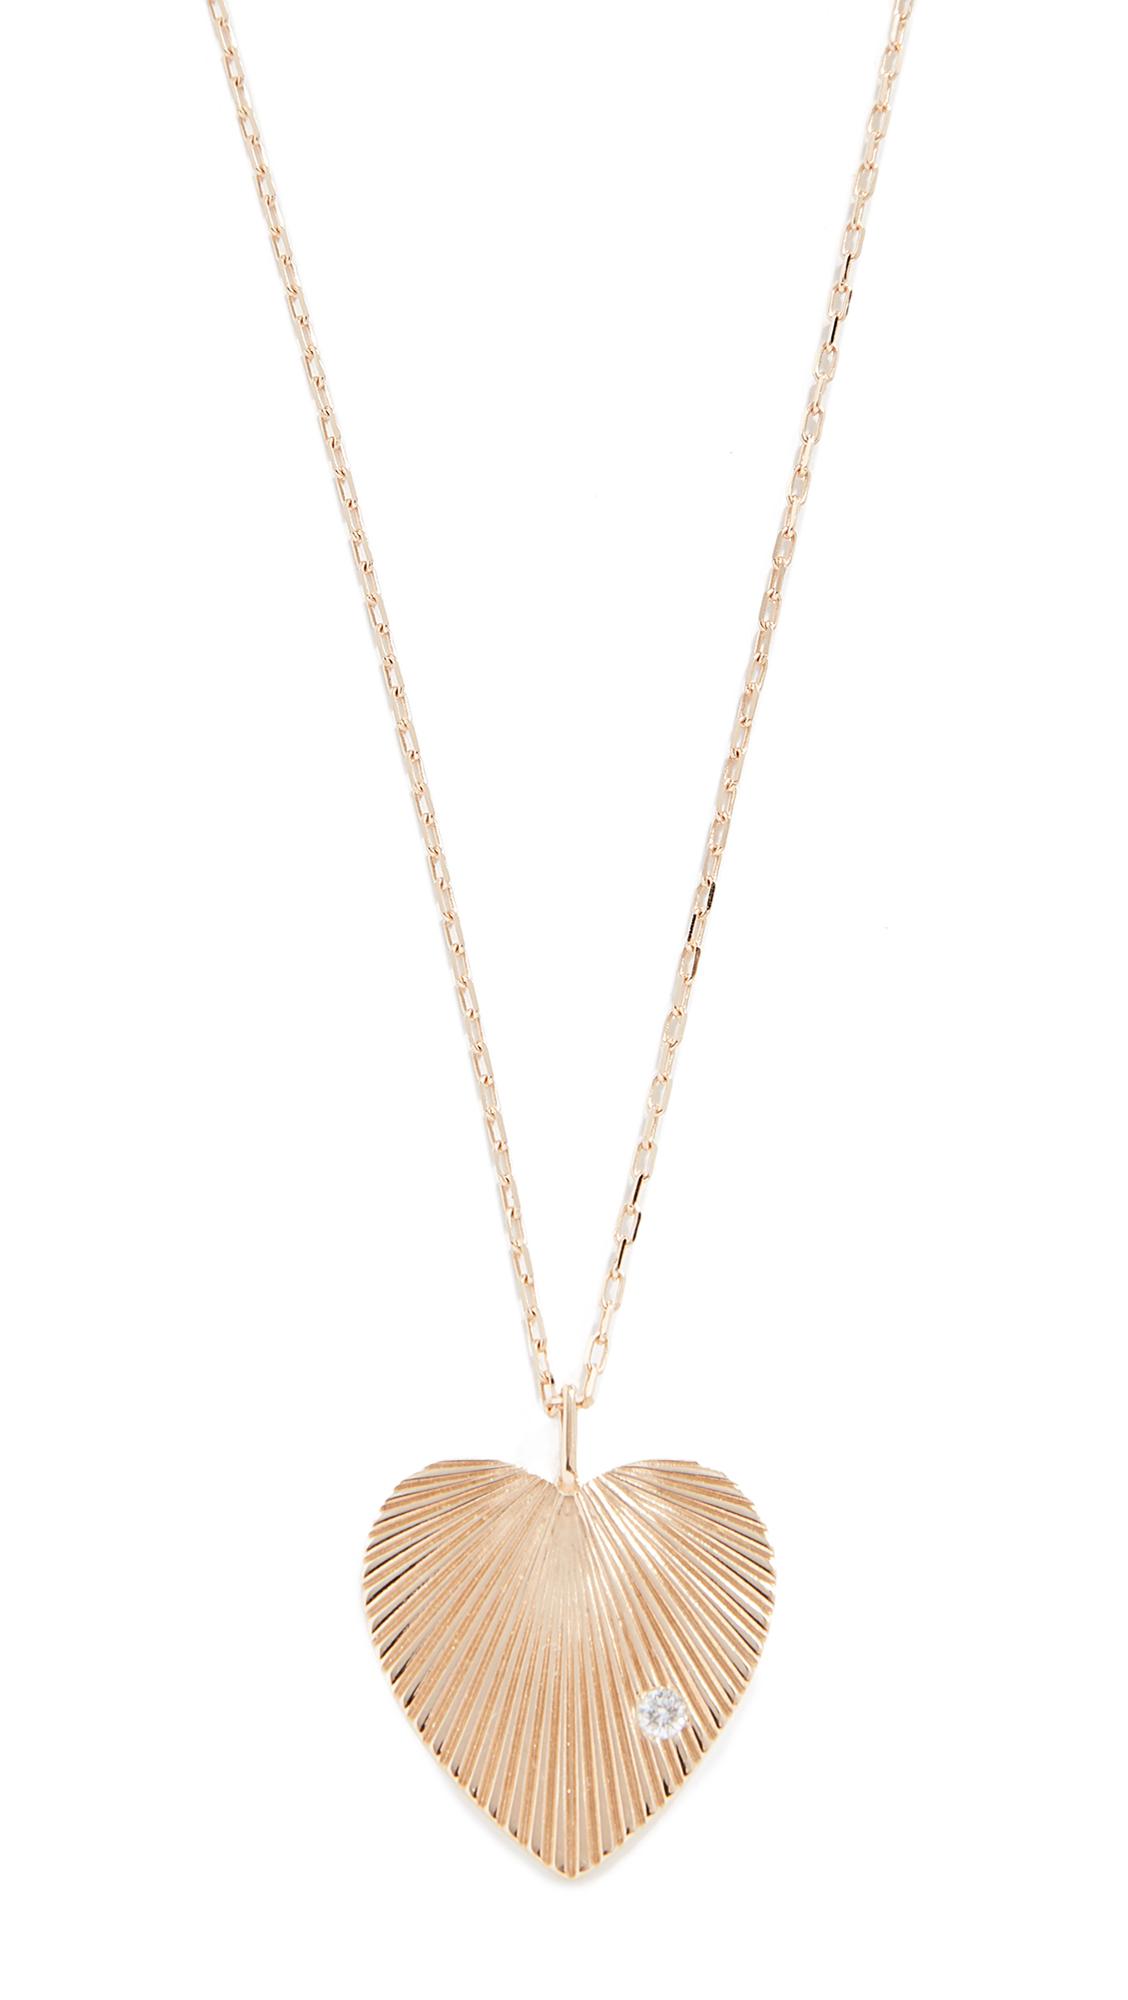 ADINA REYTER 14K Large Diamond Heart Necklace, Yellow Gold